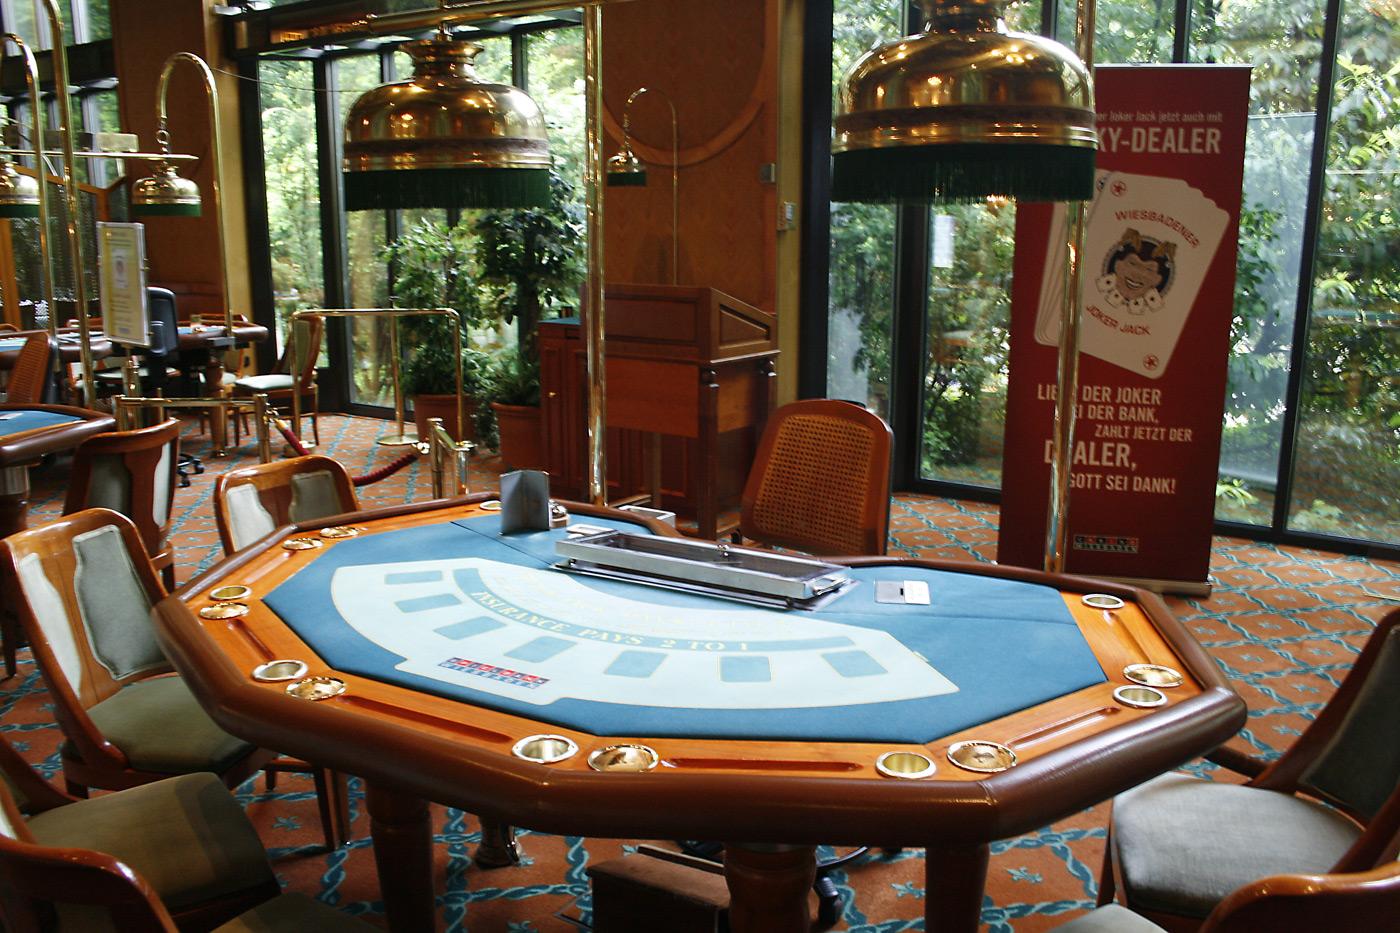 online casino gyldne palads